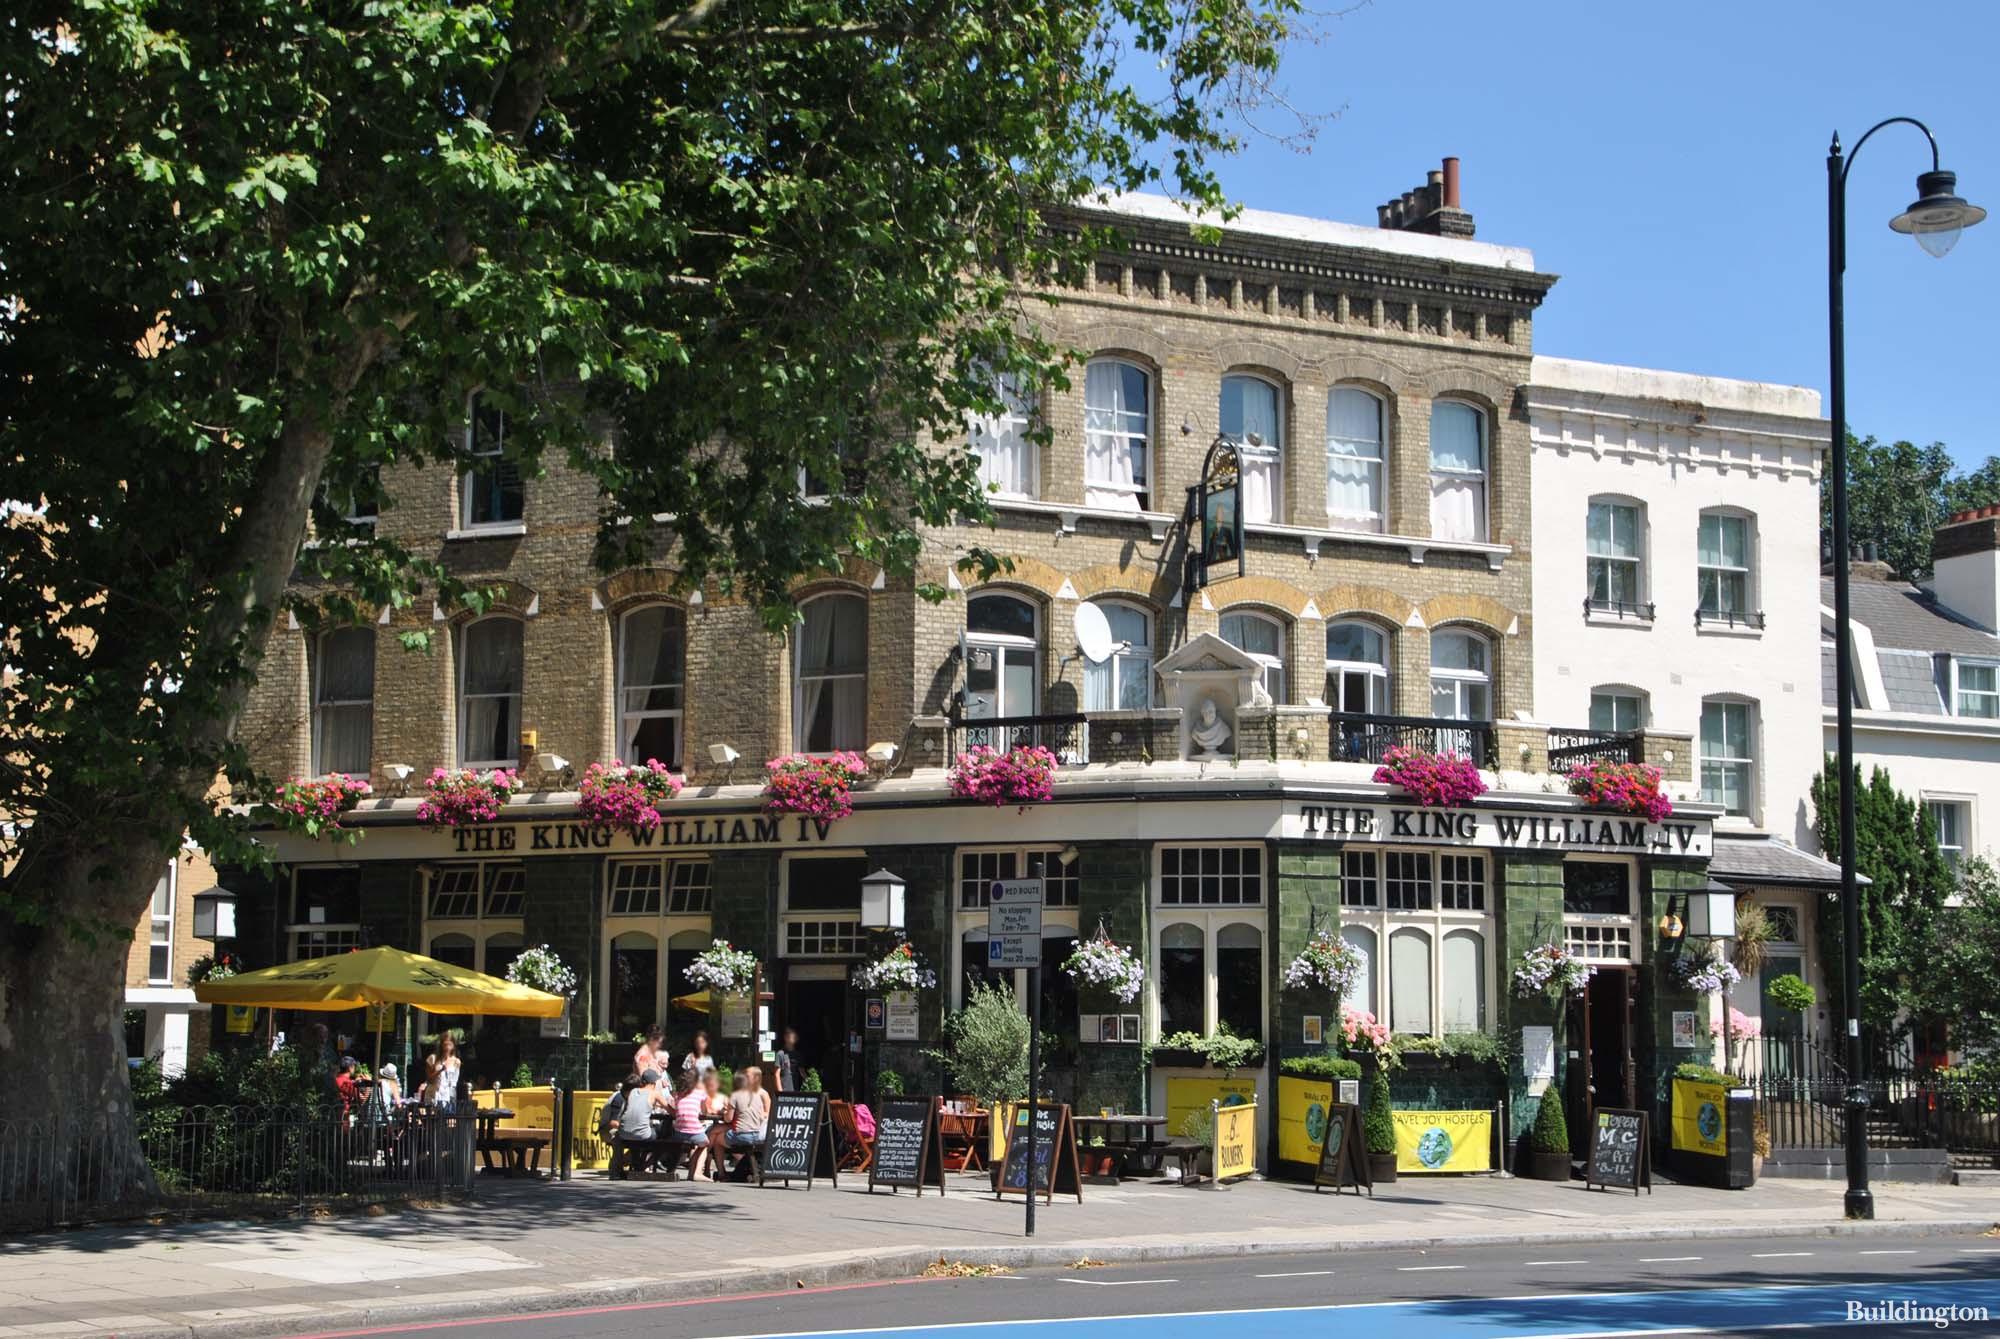 The King William IV at 111 Grosvenor Road in Pimlico, London SW1.